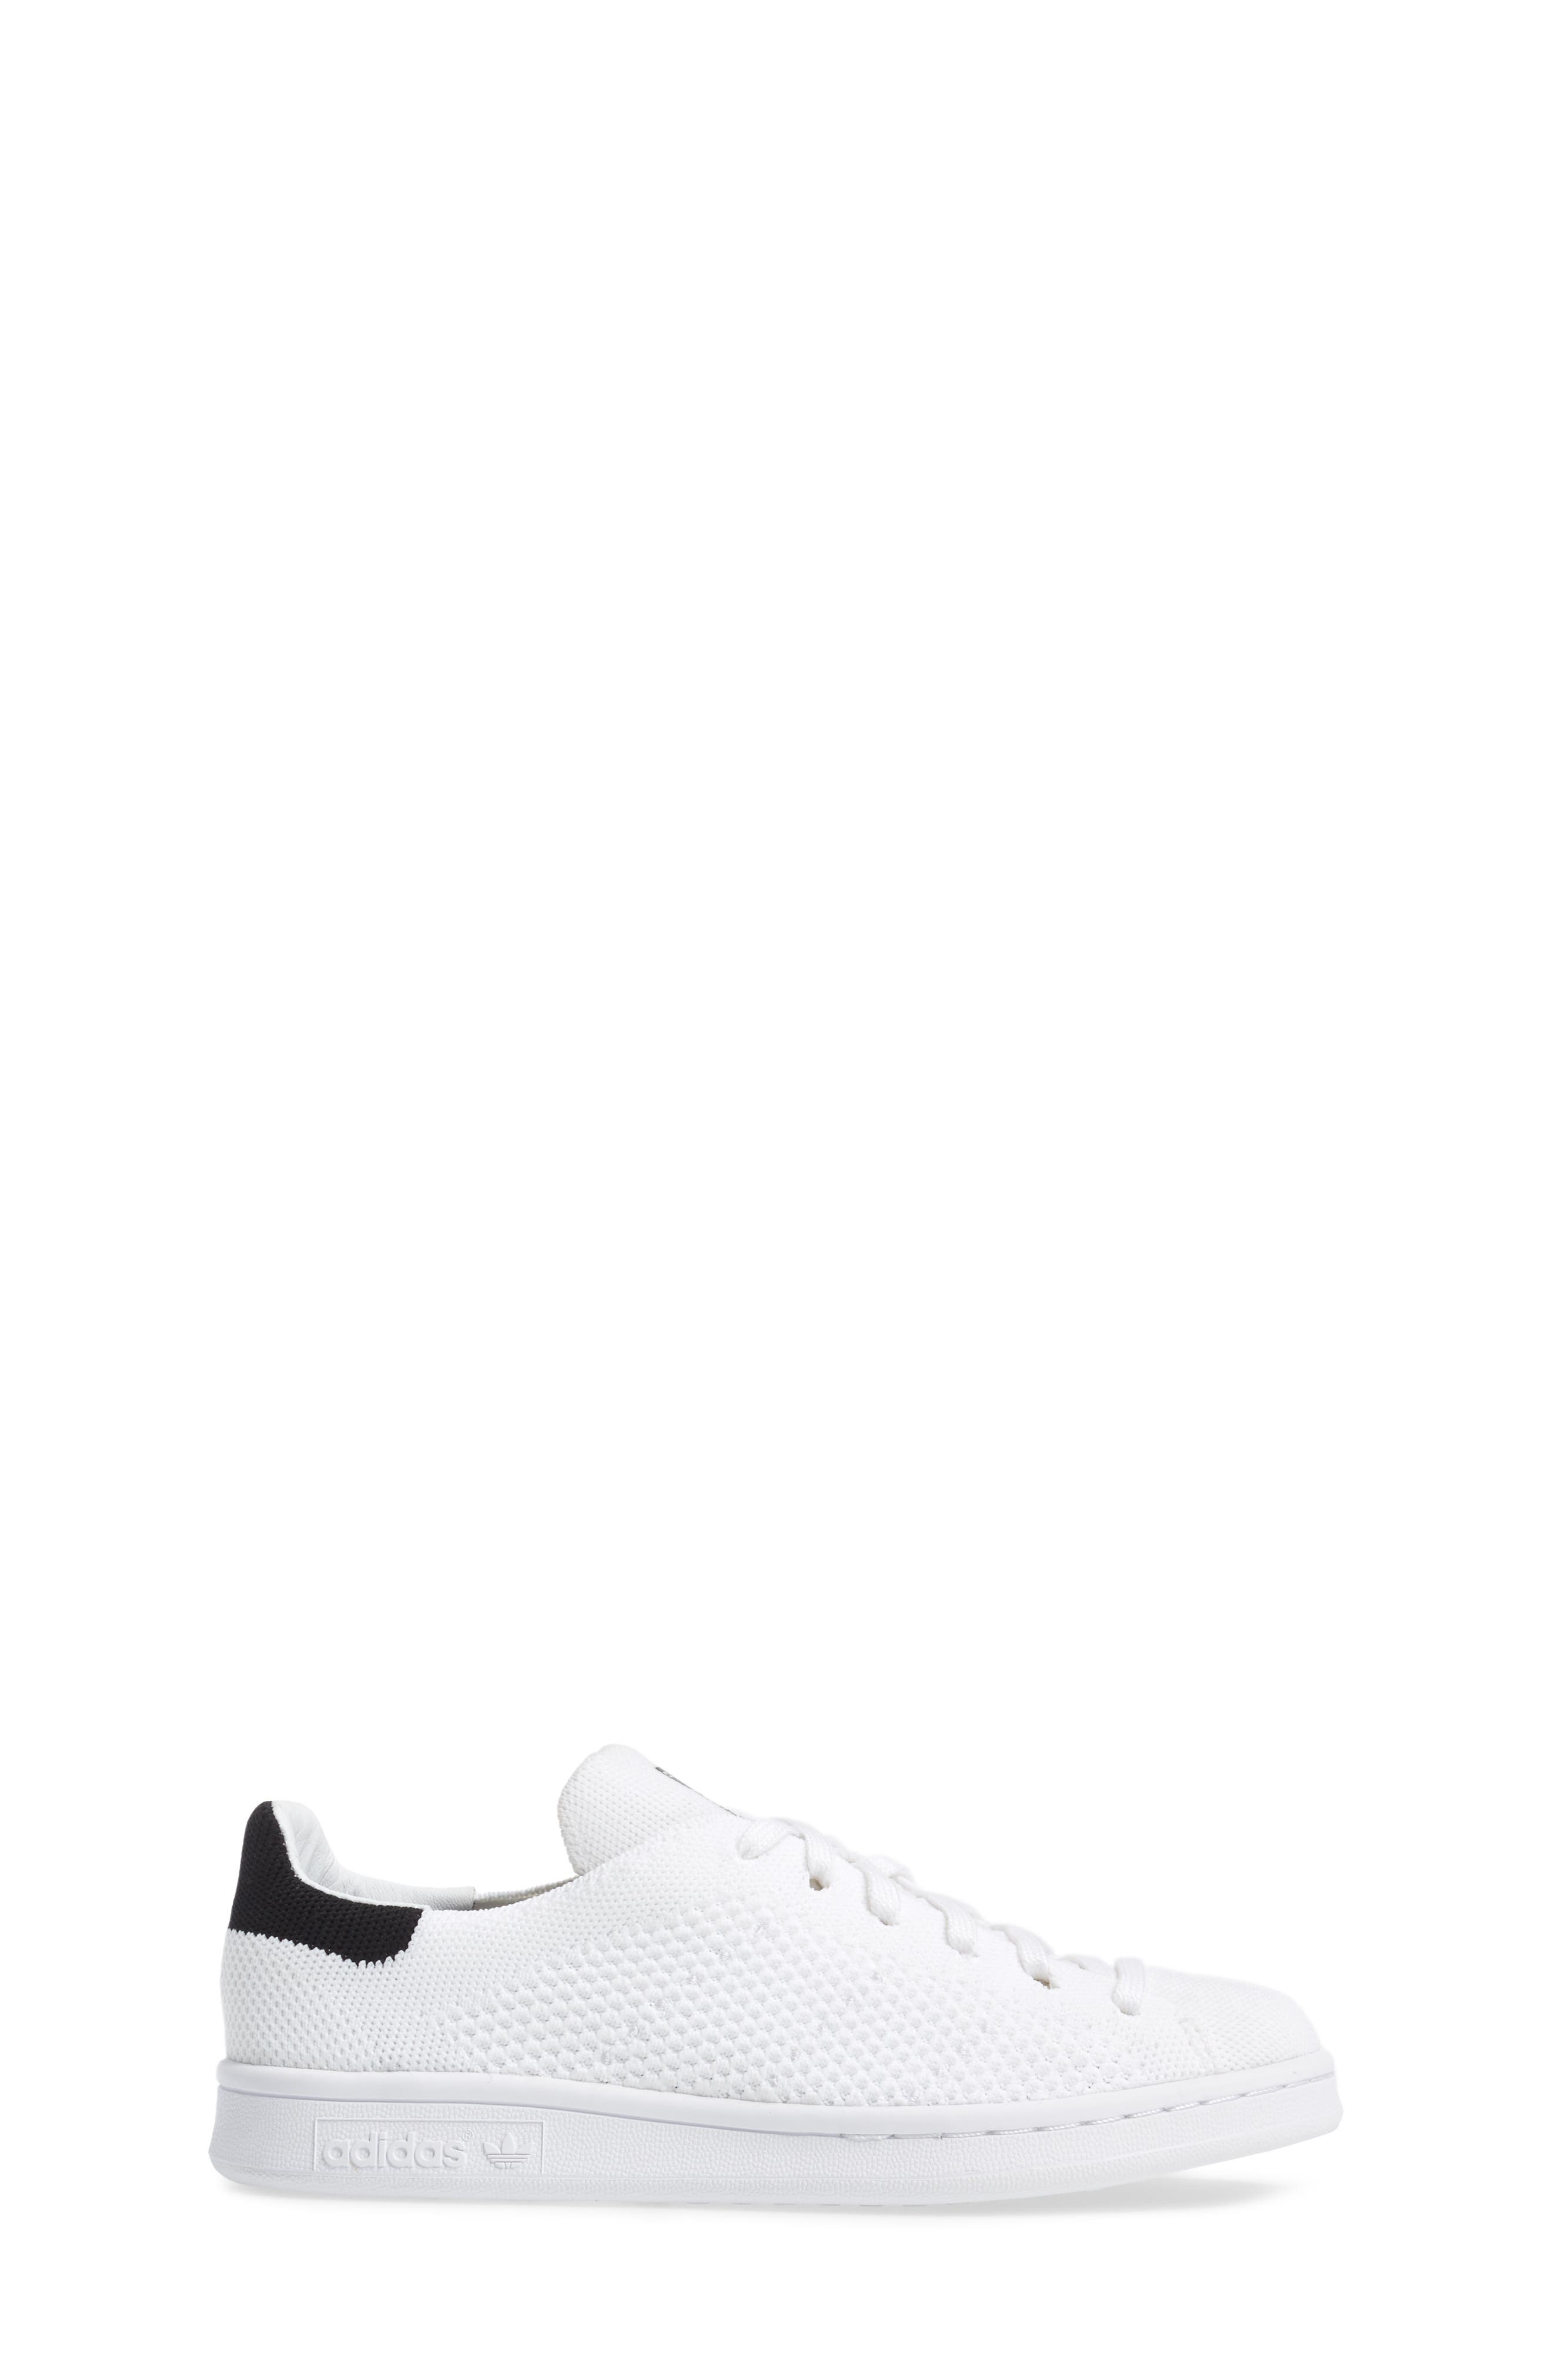 Stan Smith Primeknit Sneaker,                             Alternate thumbnail 3, color,                             Footwear White